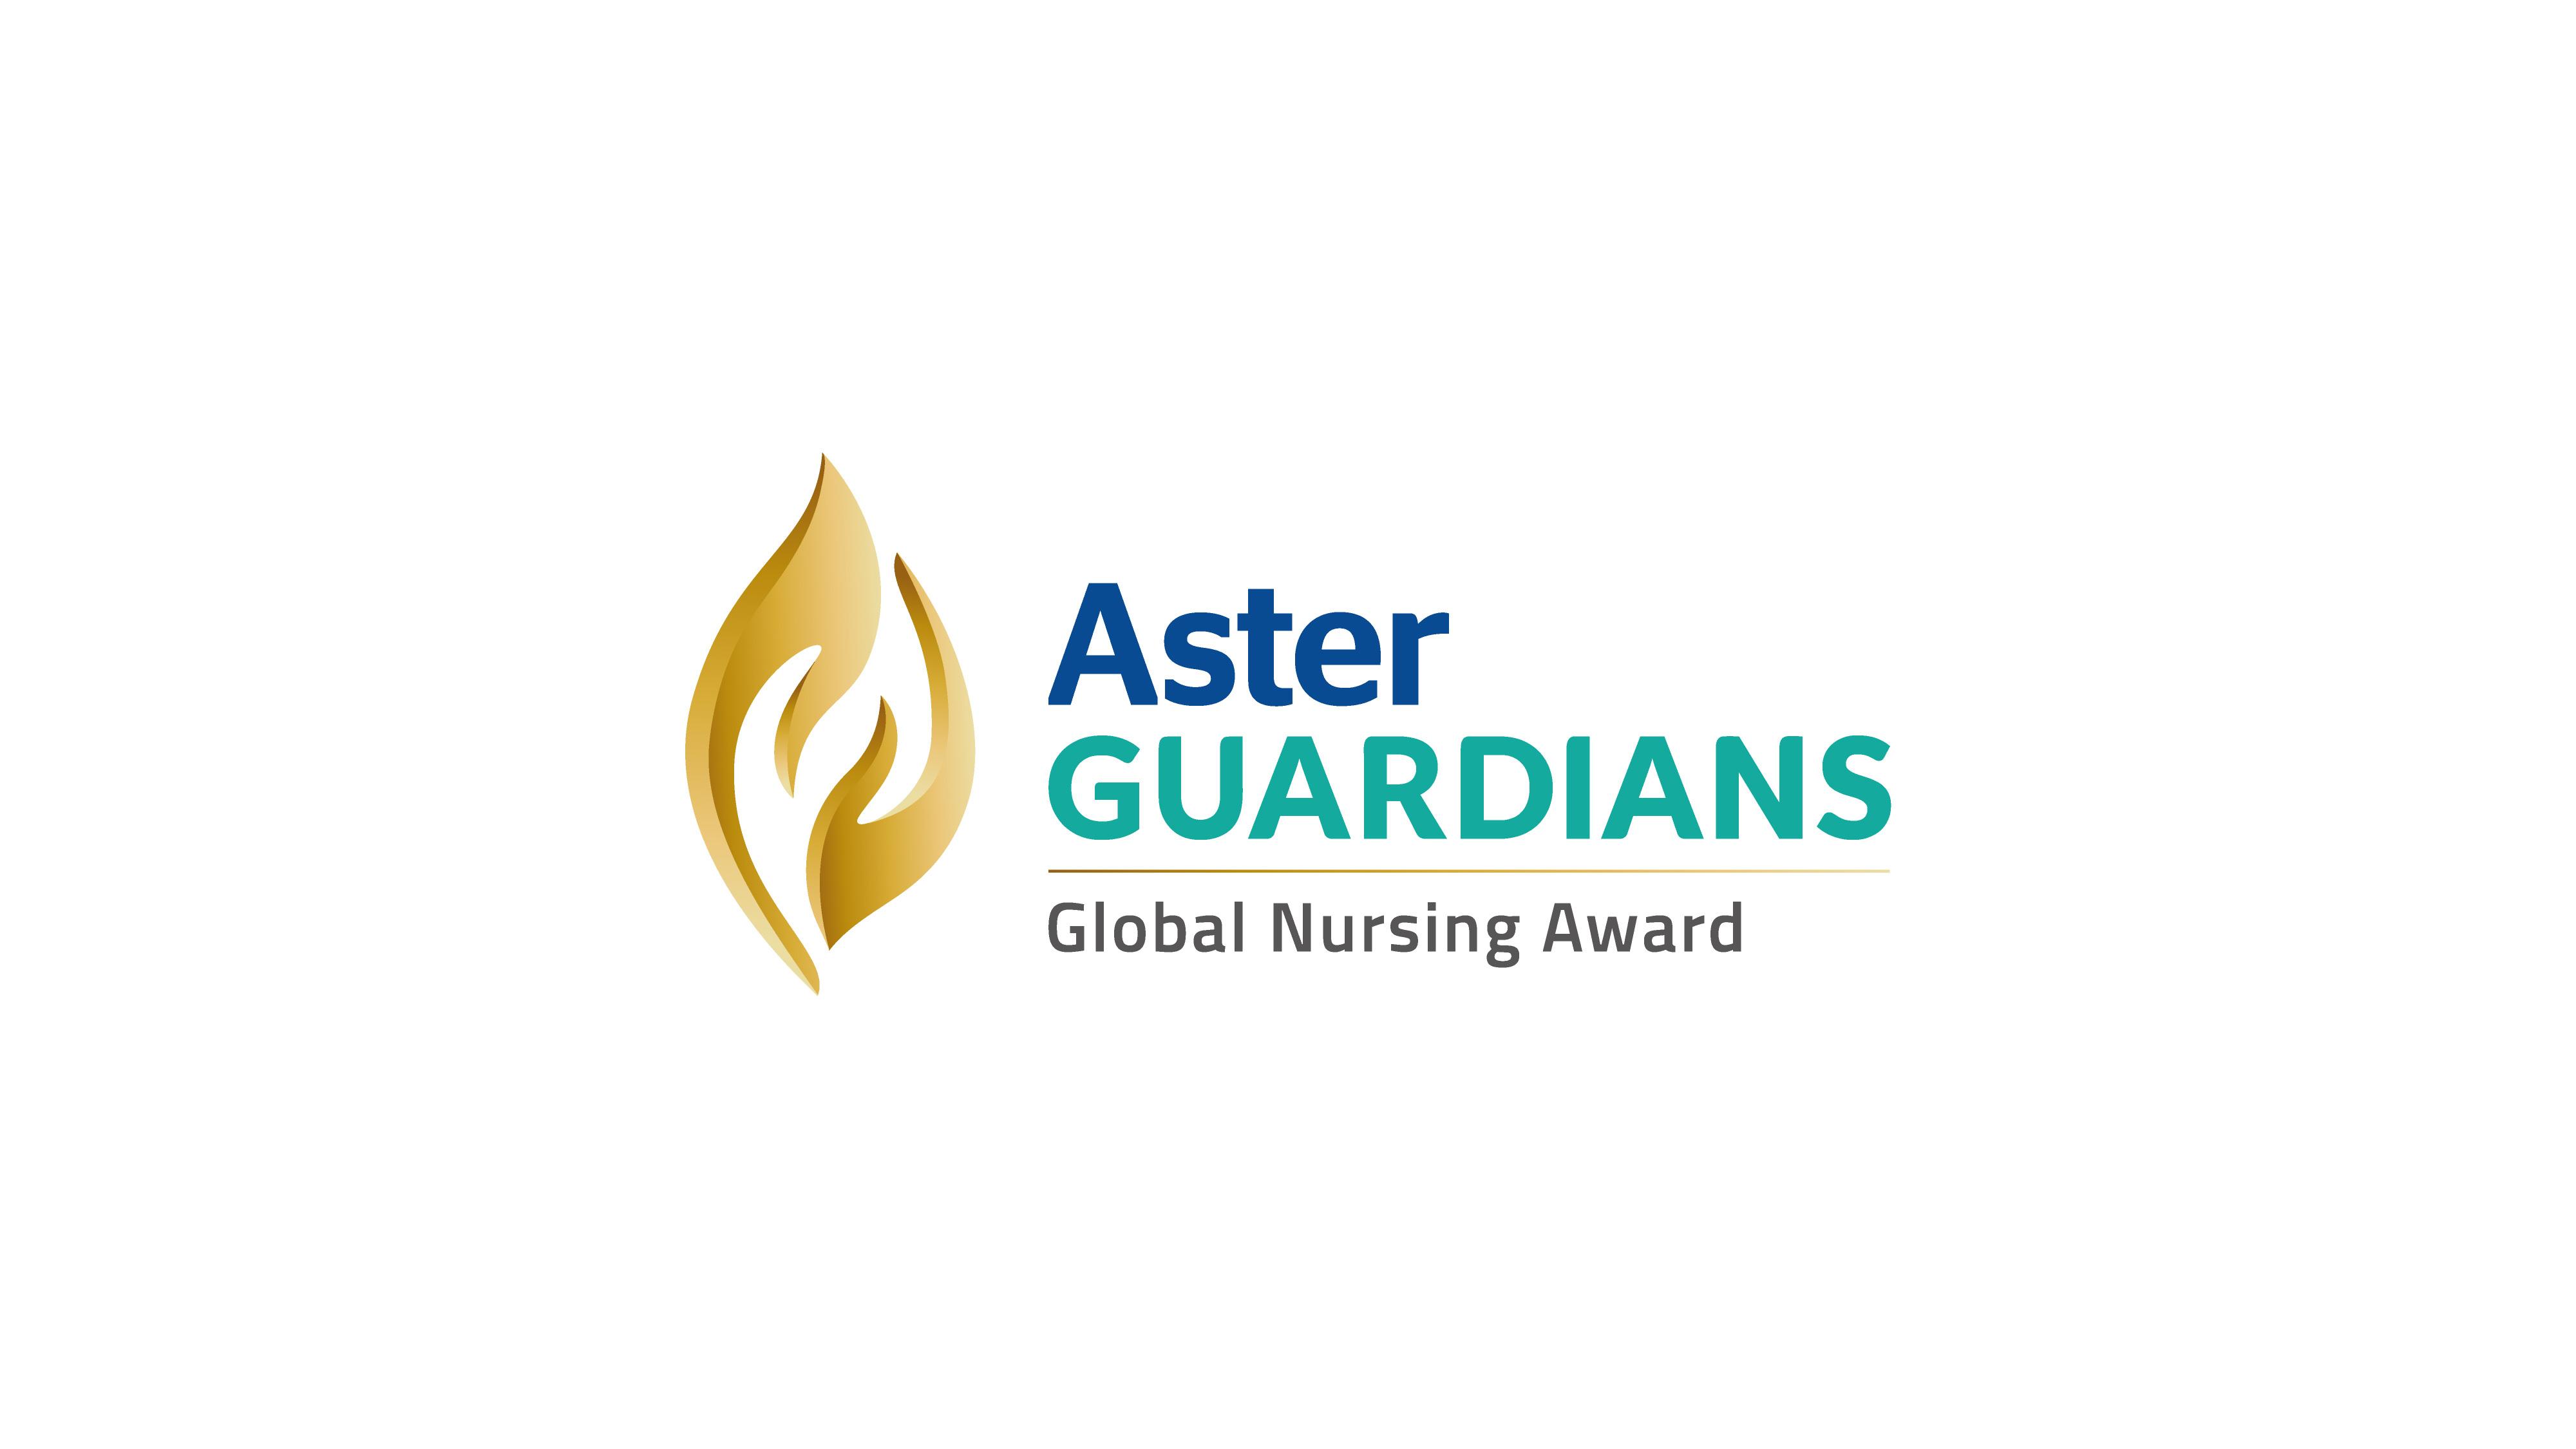 Aster Guardians Logo